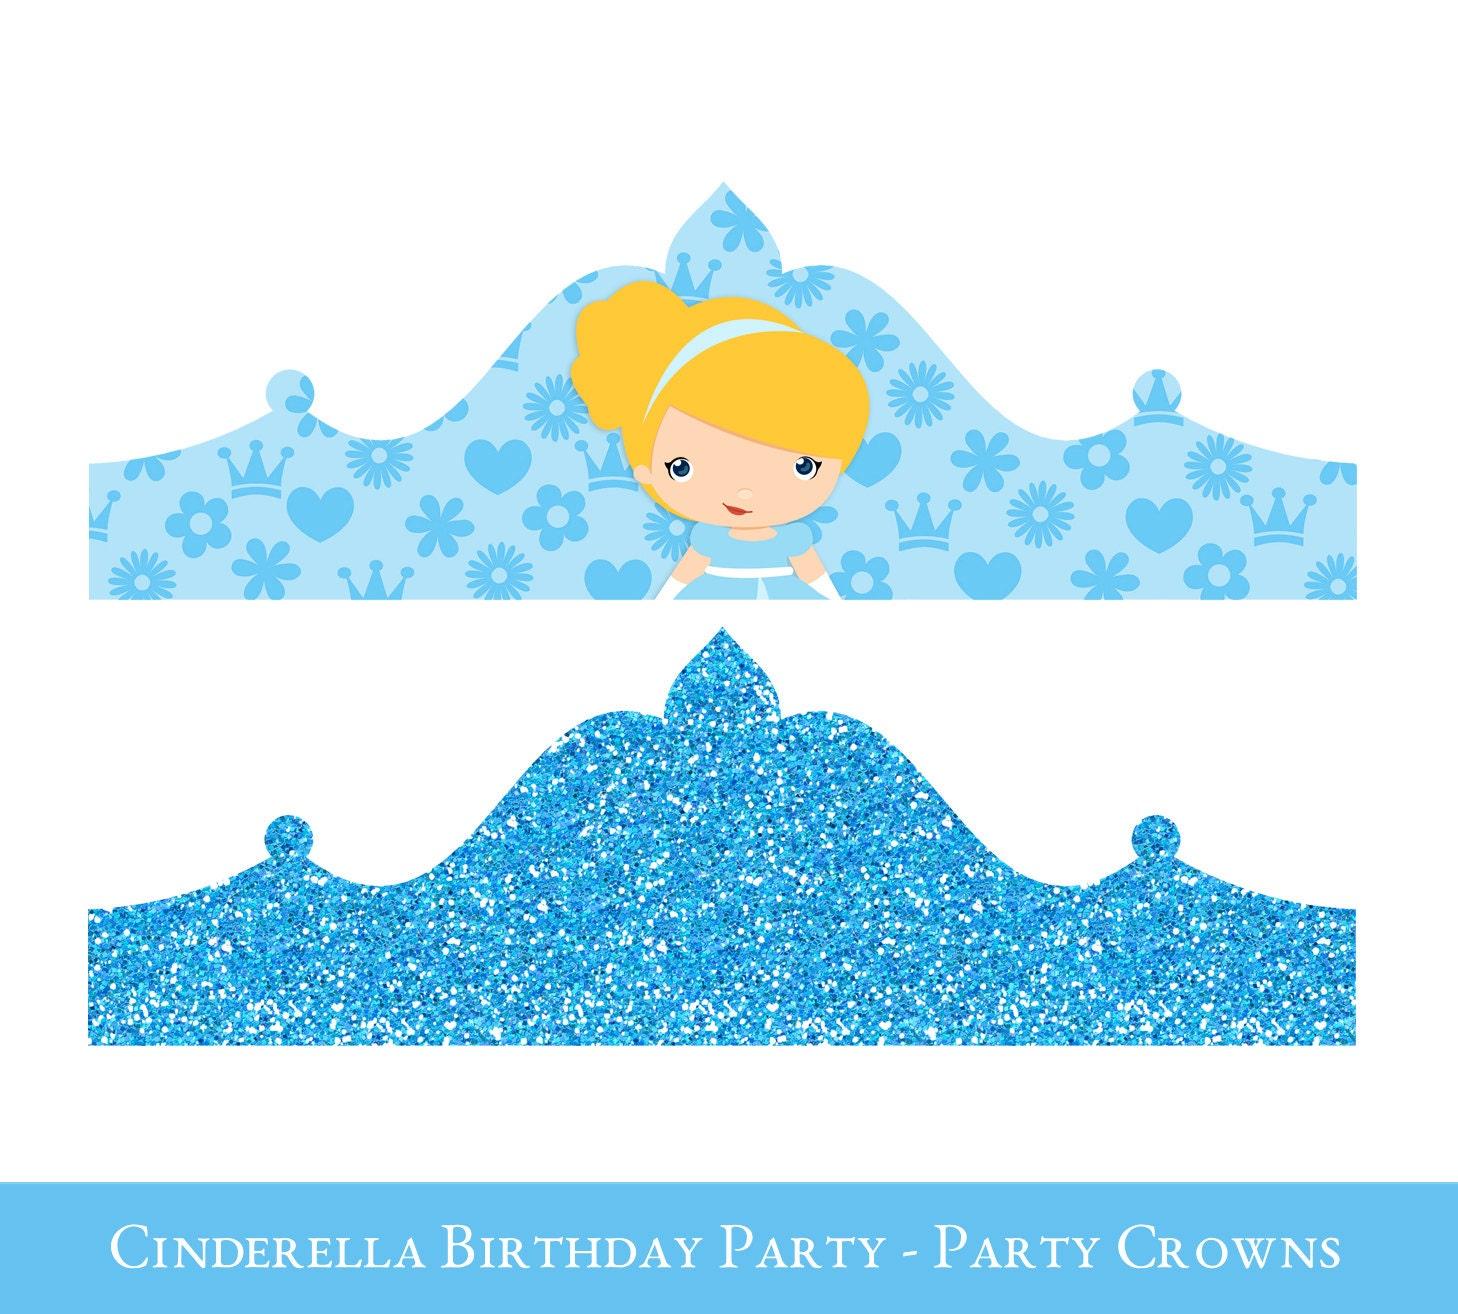 ... Princess Crowns Printable Popular items for cinderella crown on etsy